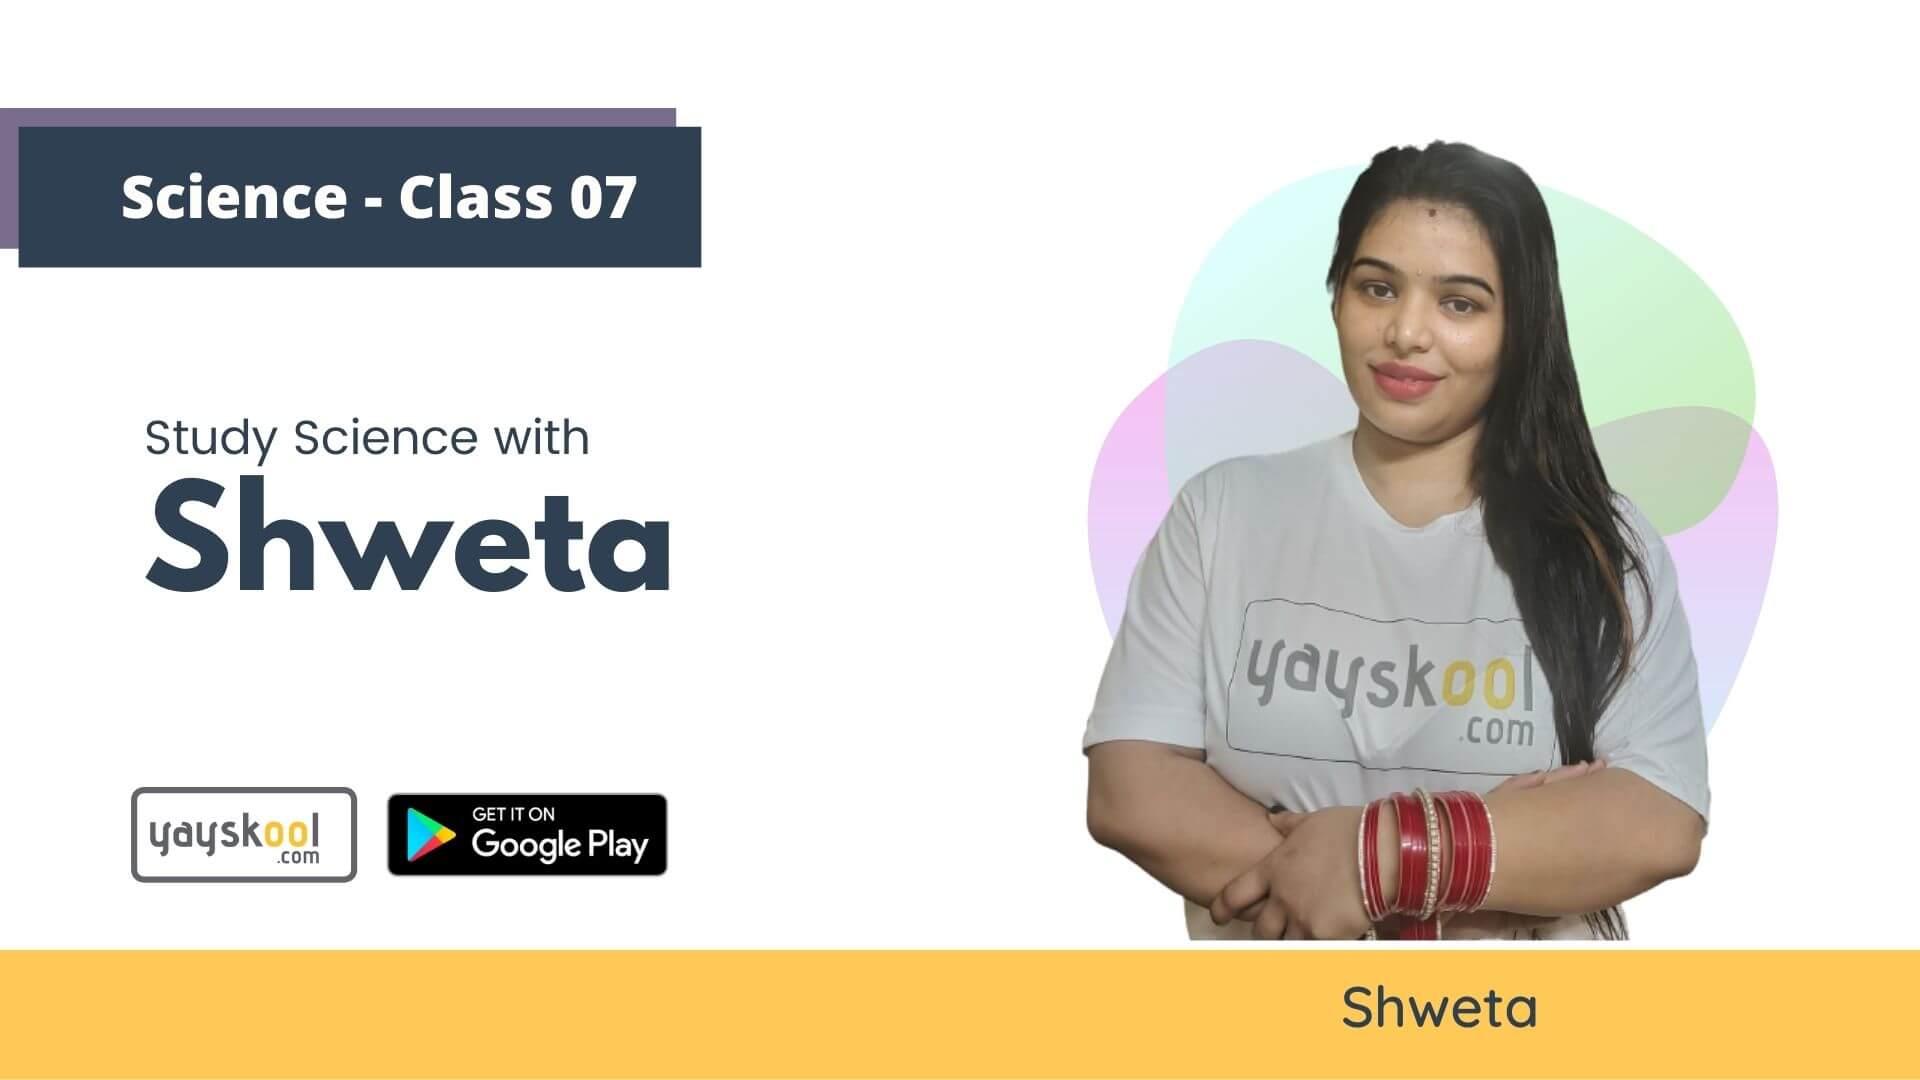 science-course-class07-shweta